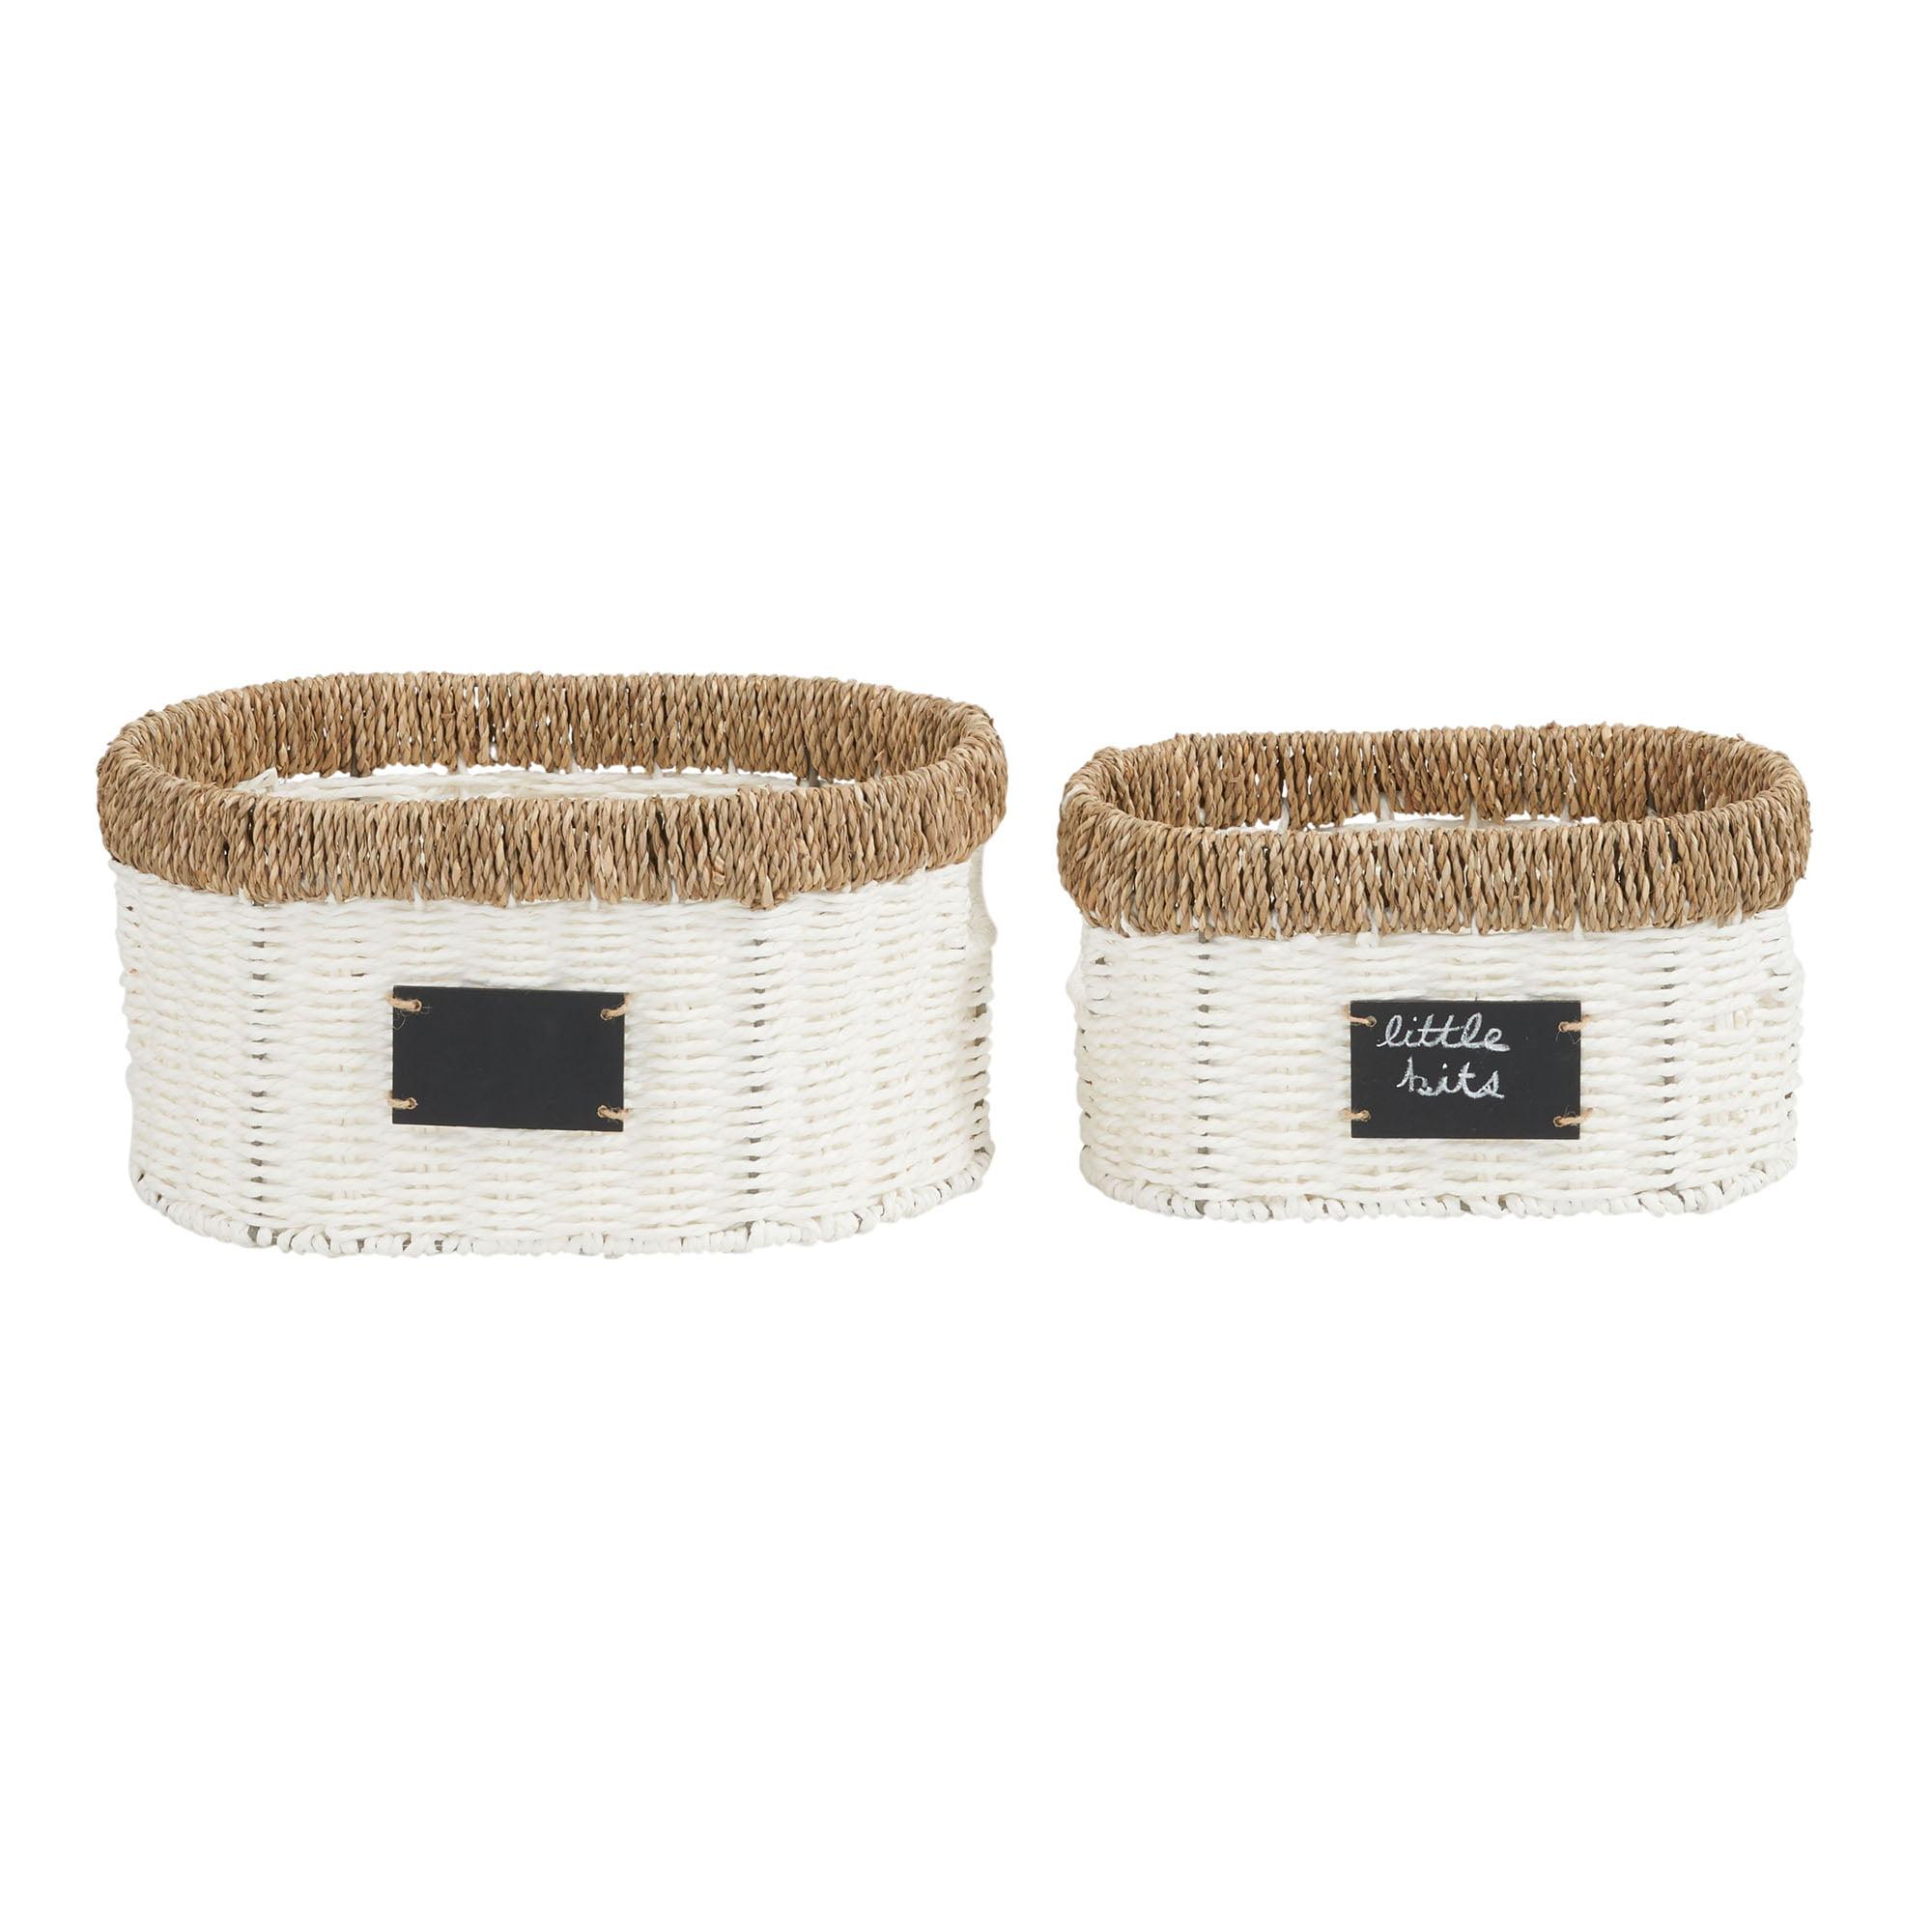 Household Essentials Natural Rim Oval Set Paper Rope And Seagrass 2 Piece Wicker Basket Walmart Com Walmart Com